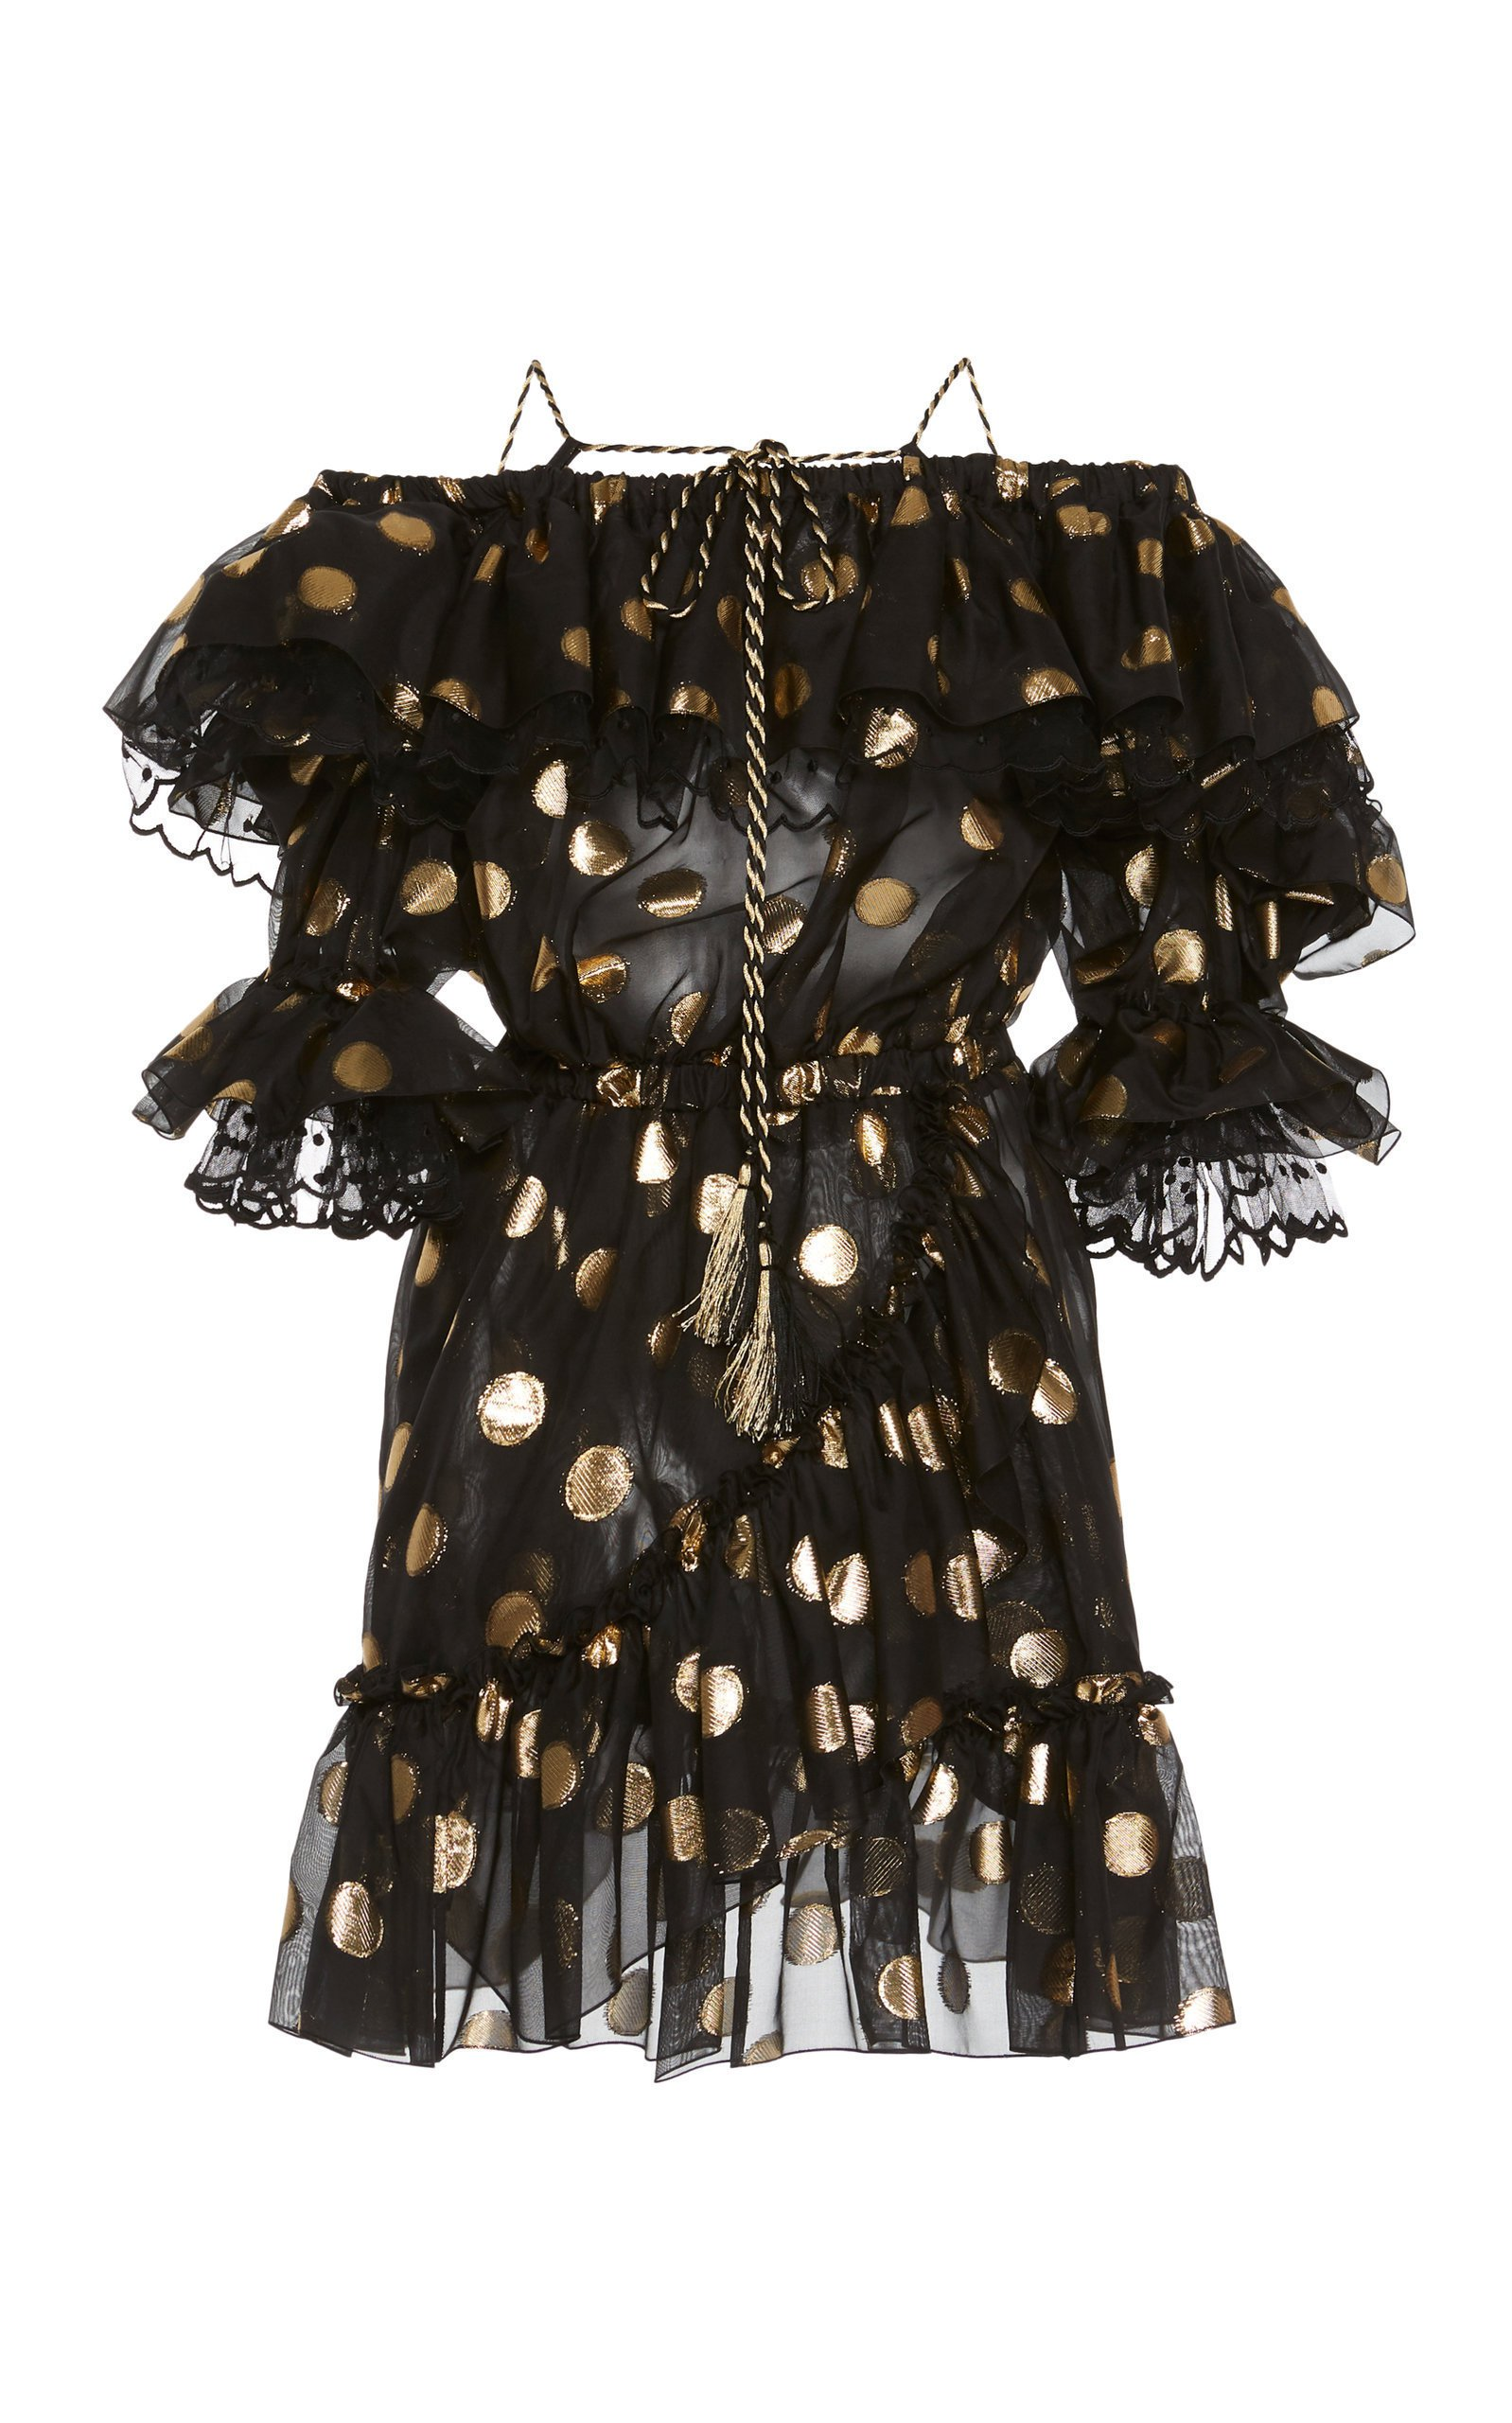 Dundas Polka Dot Ruffled Mini Dress